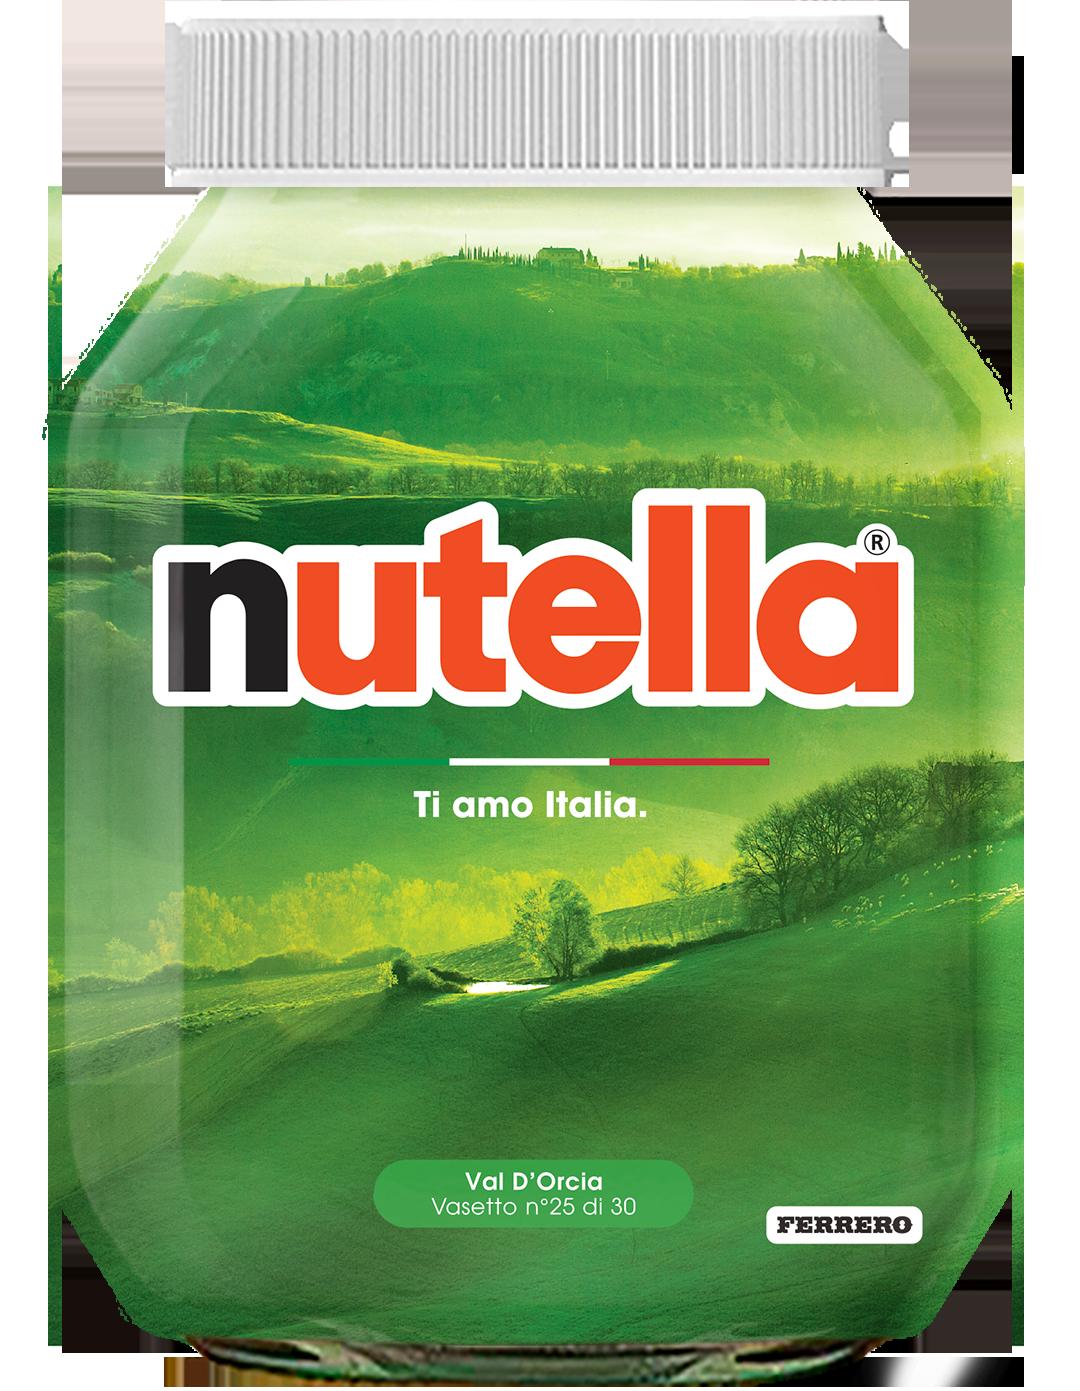 Toscana - Val D'Orcia - i vasetti di nutella dedicati all'italia